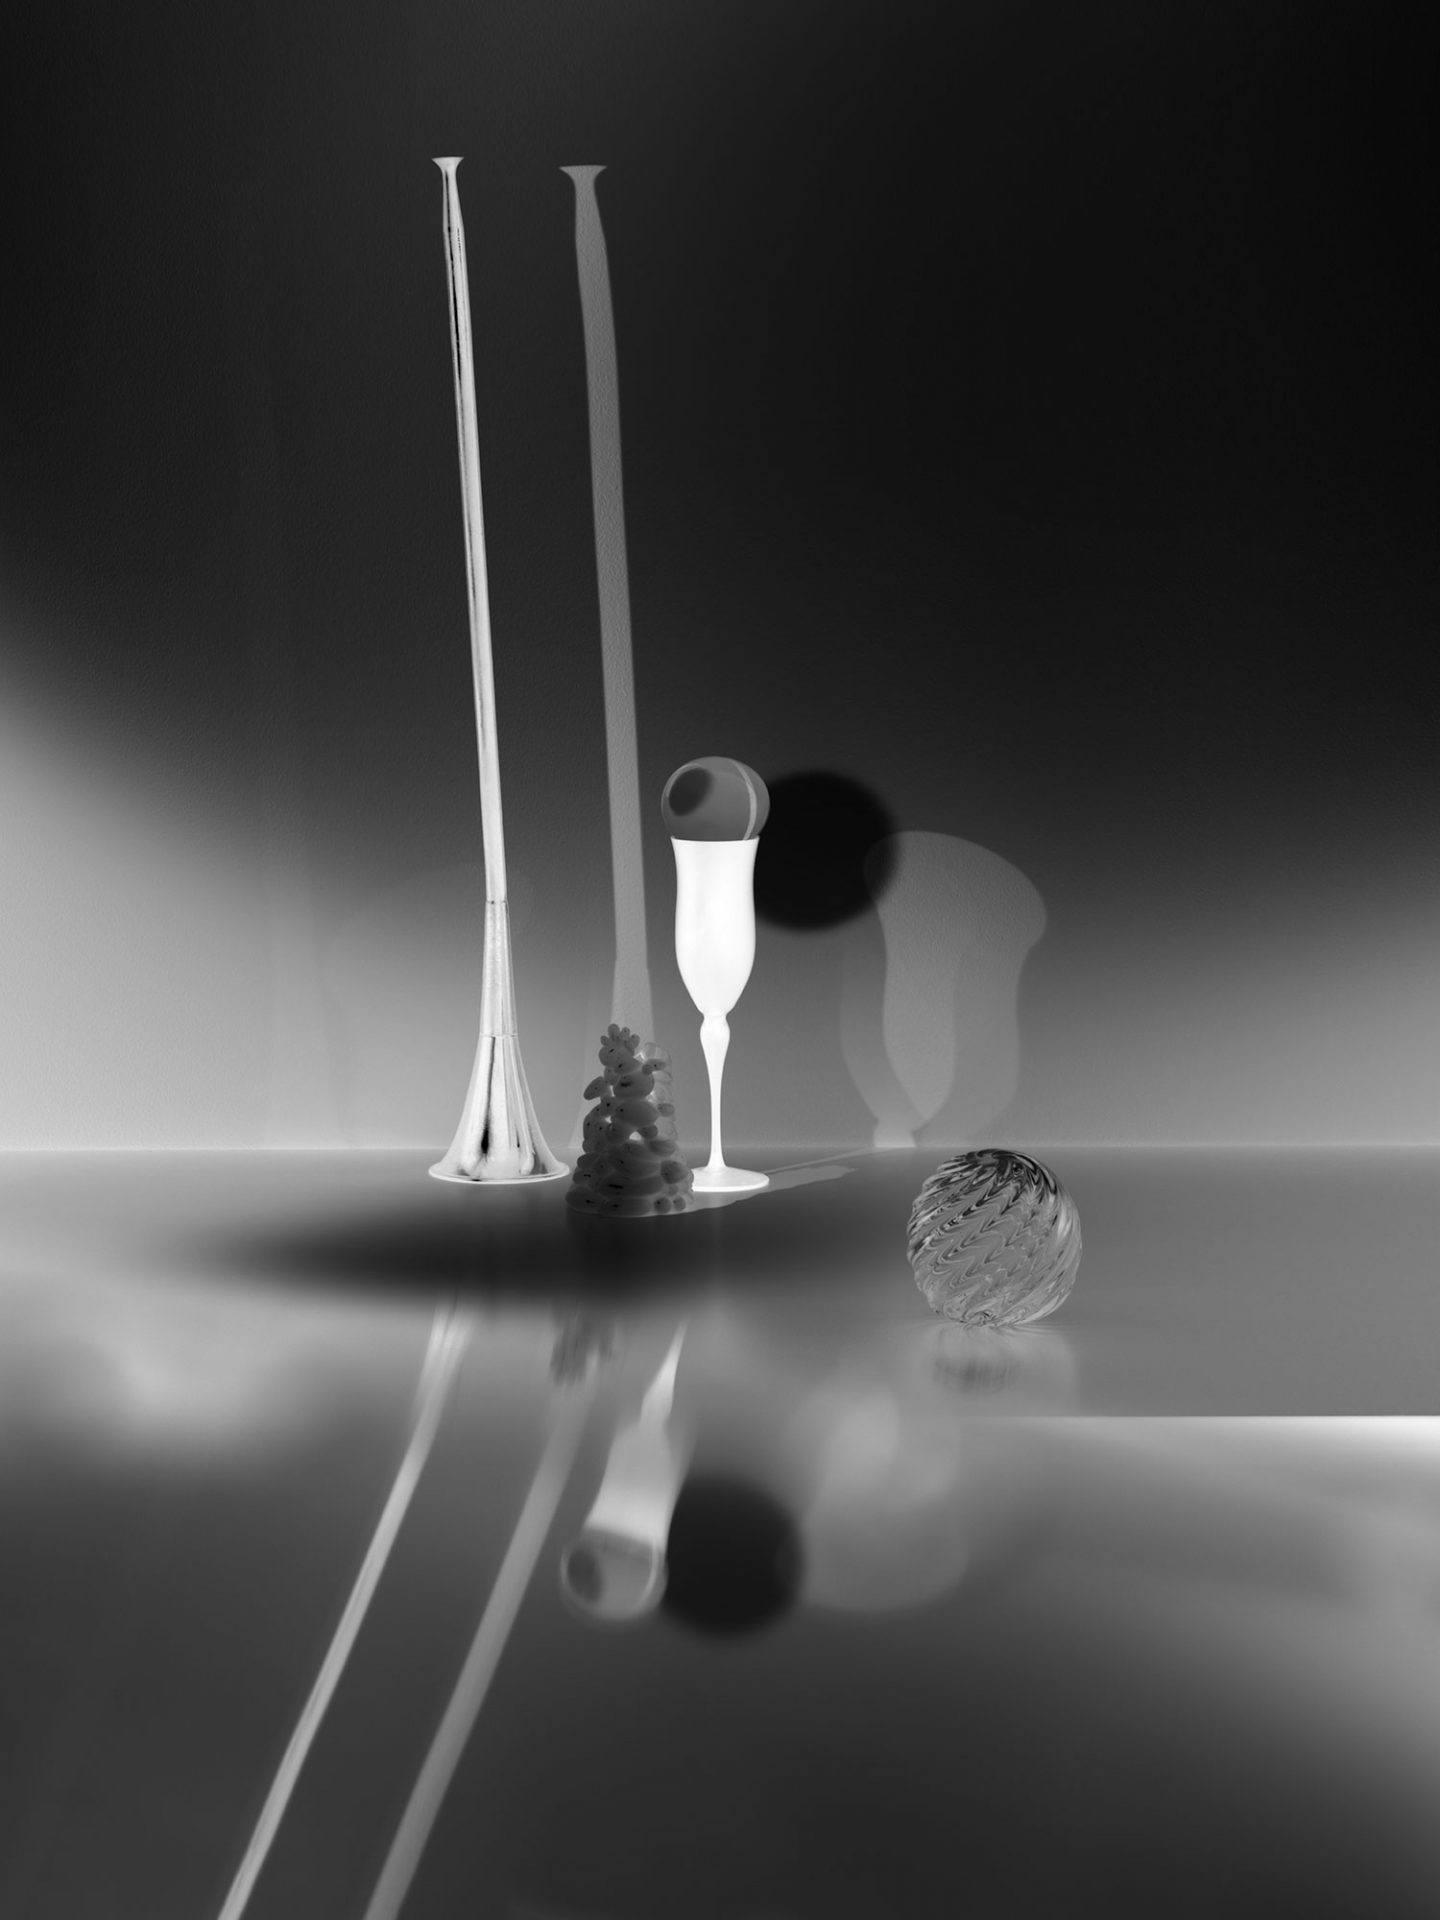 IGNANT-Photography-MarcusSchaefer-28